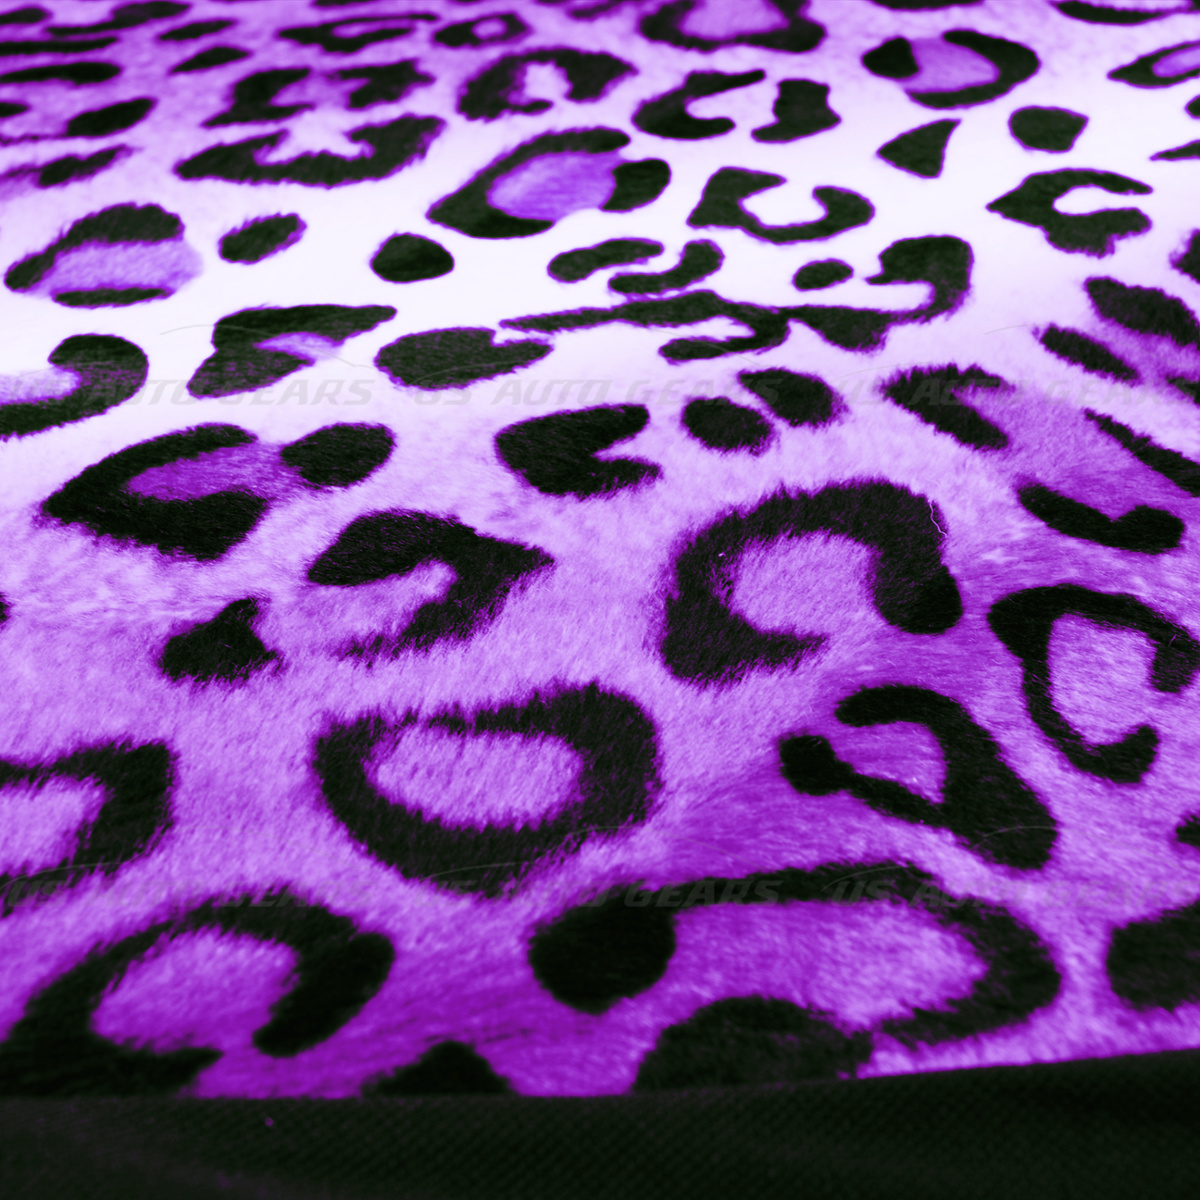 Purple Leopard Print Background Image